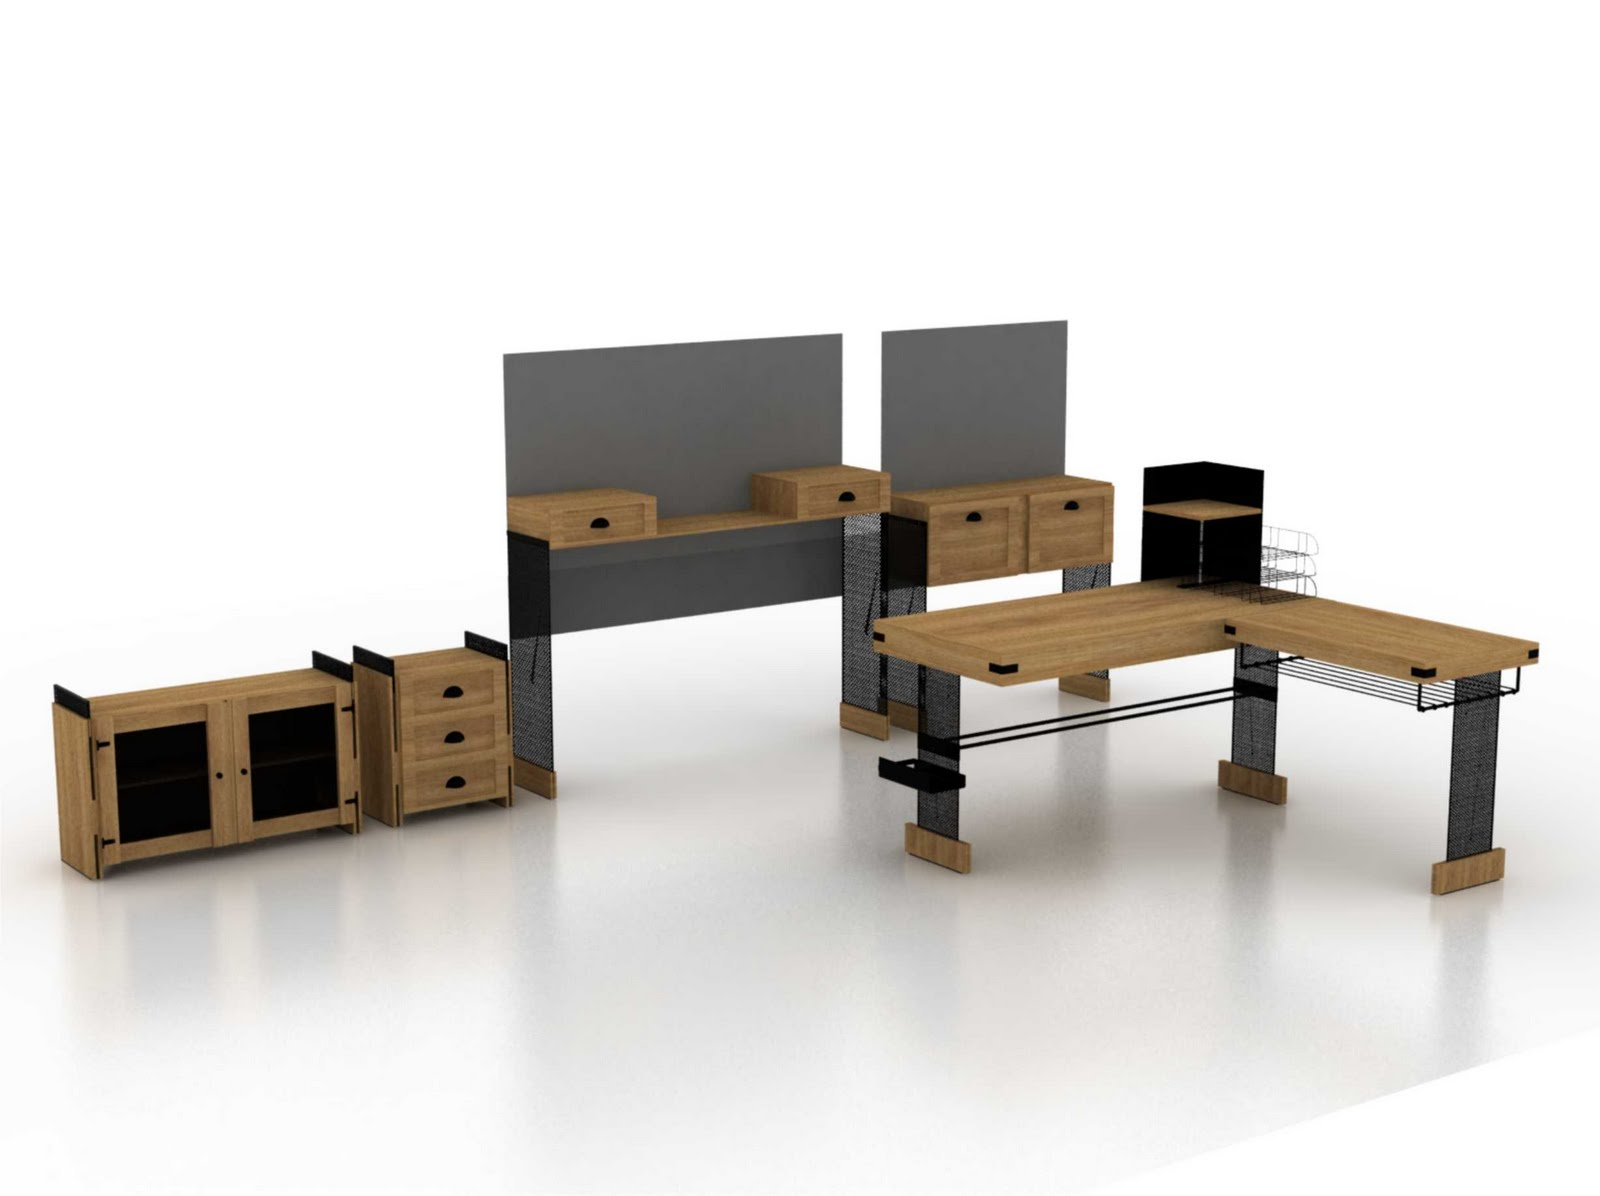 Portfolio di picardo luz mobiliario oficina hogare a for Mobiliario oficina diseno